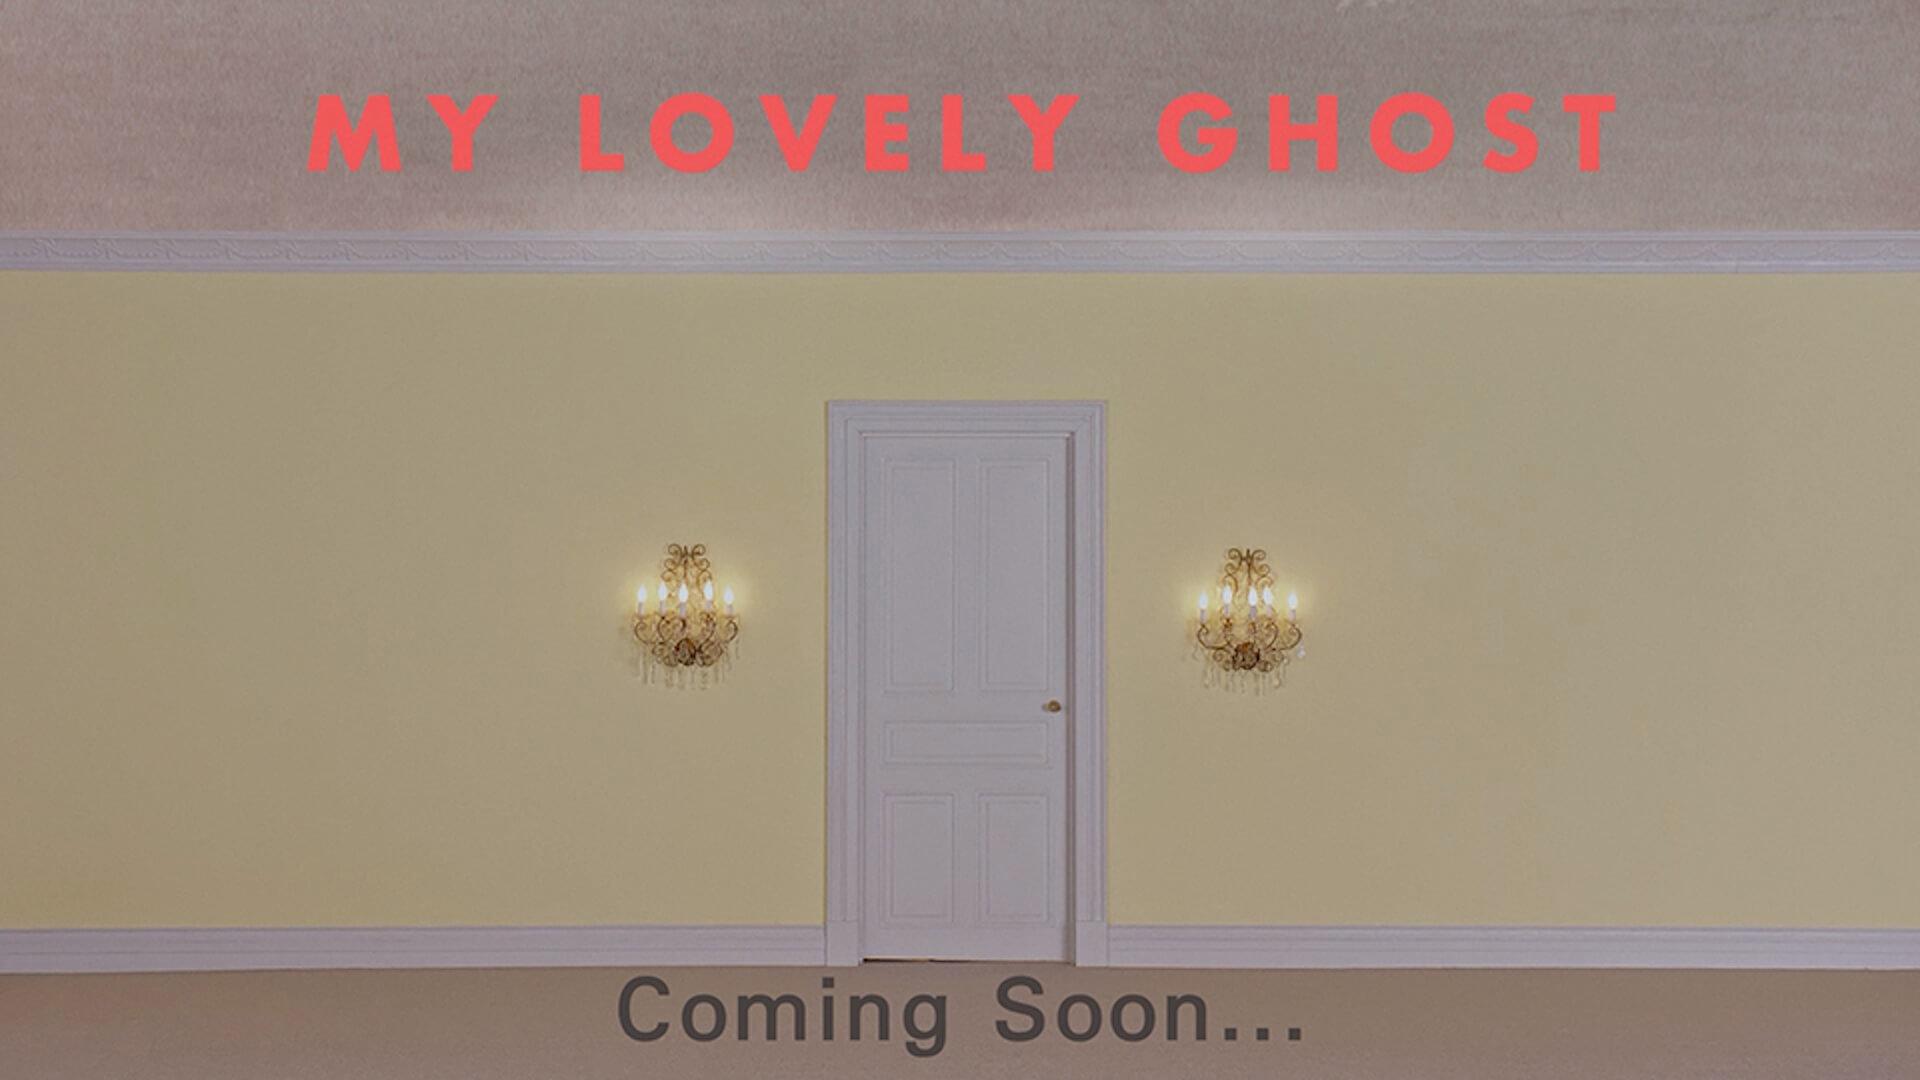 "YUKIのニューアルバム『Terminal』収録""My lovely ghost""のMVティザー映像が解禁!ラジオ出演も決定 music210415_yuki_1"